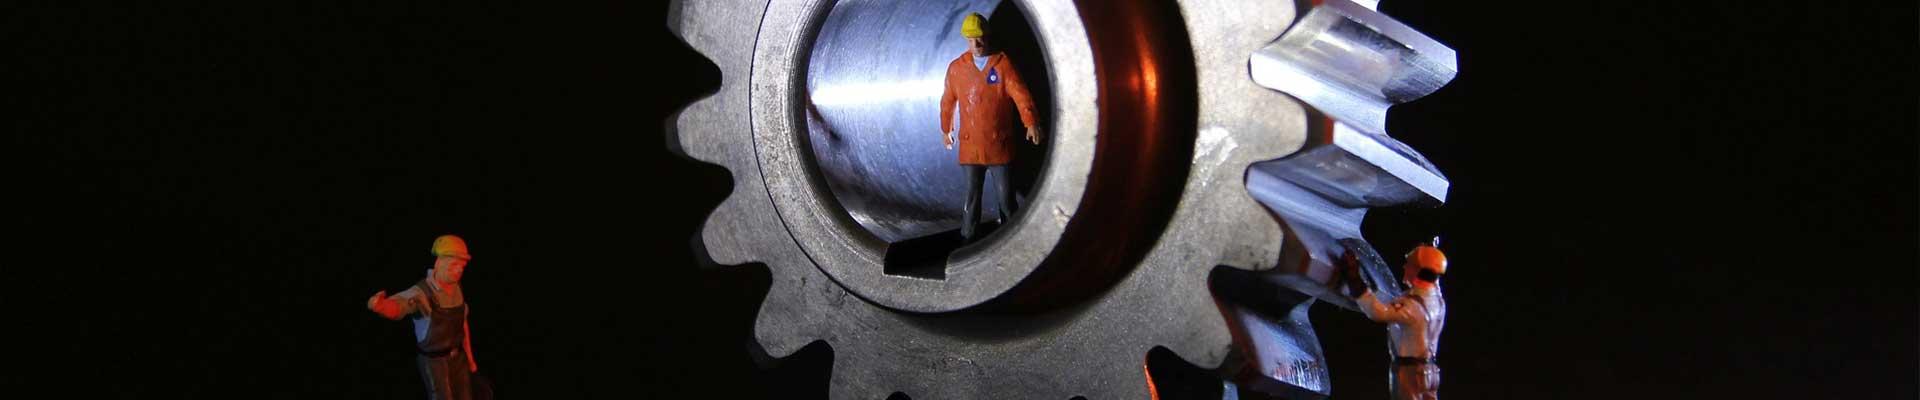 Maschinenbau Karriere